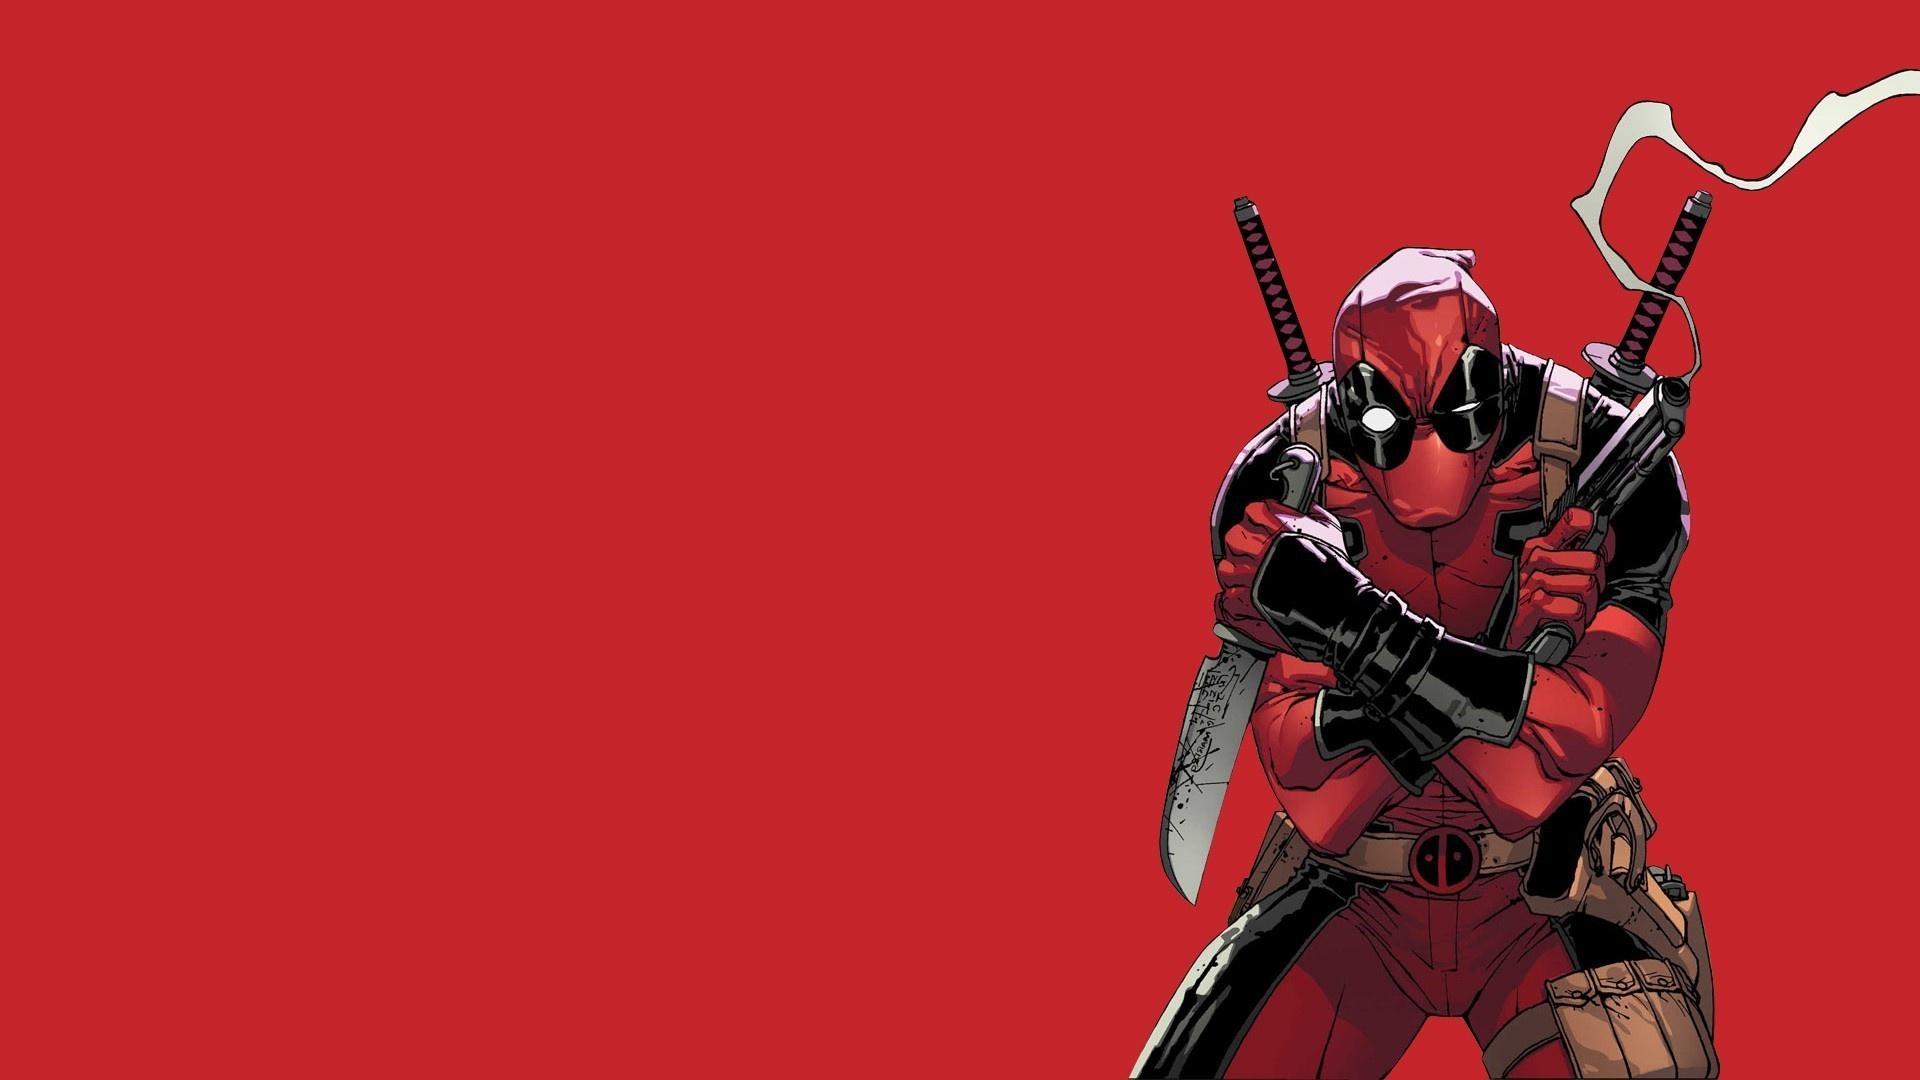 480+21x21 Spooky Minimal Deadpool 21x21 Resolution Wallpaper ...